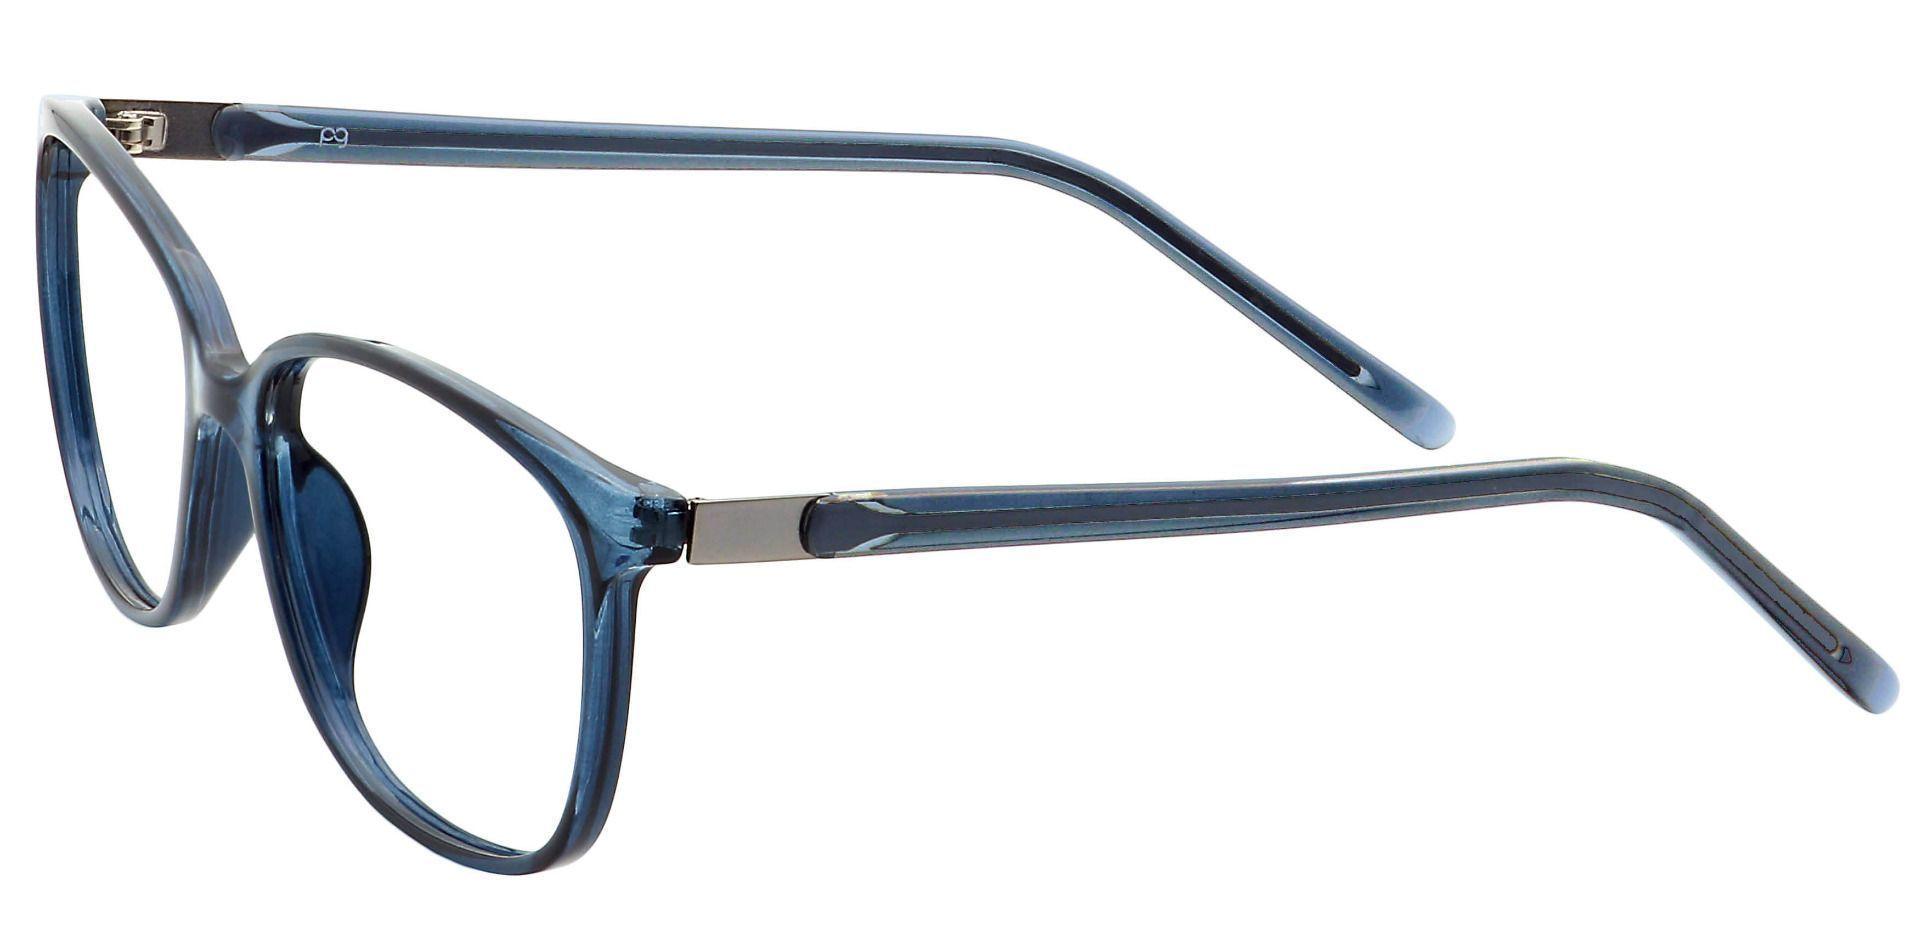 Archie Square Progressive Glasses - Blue